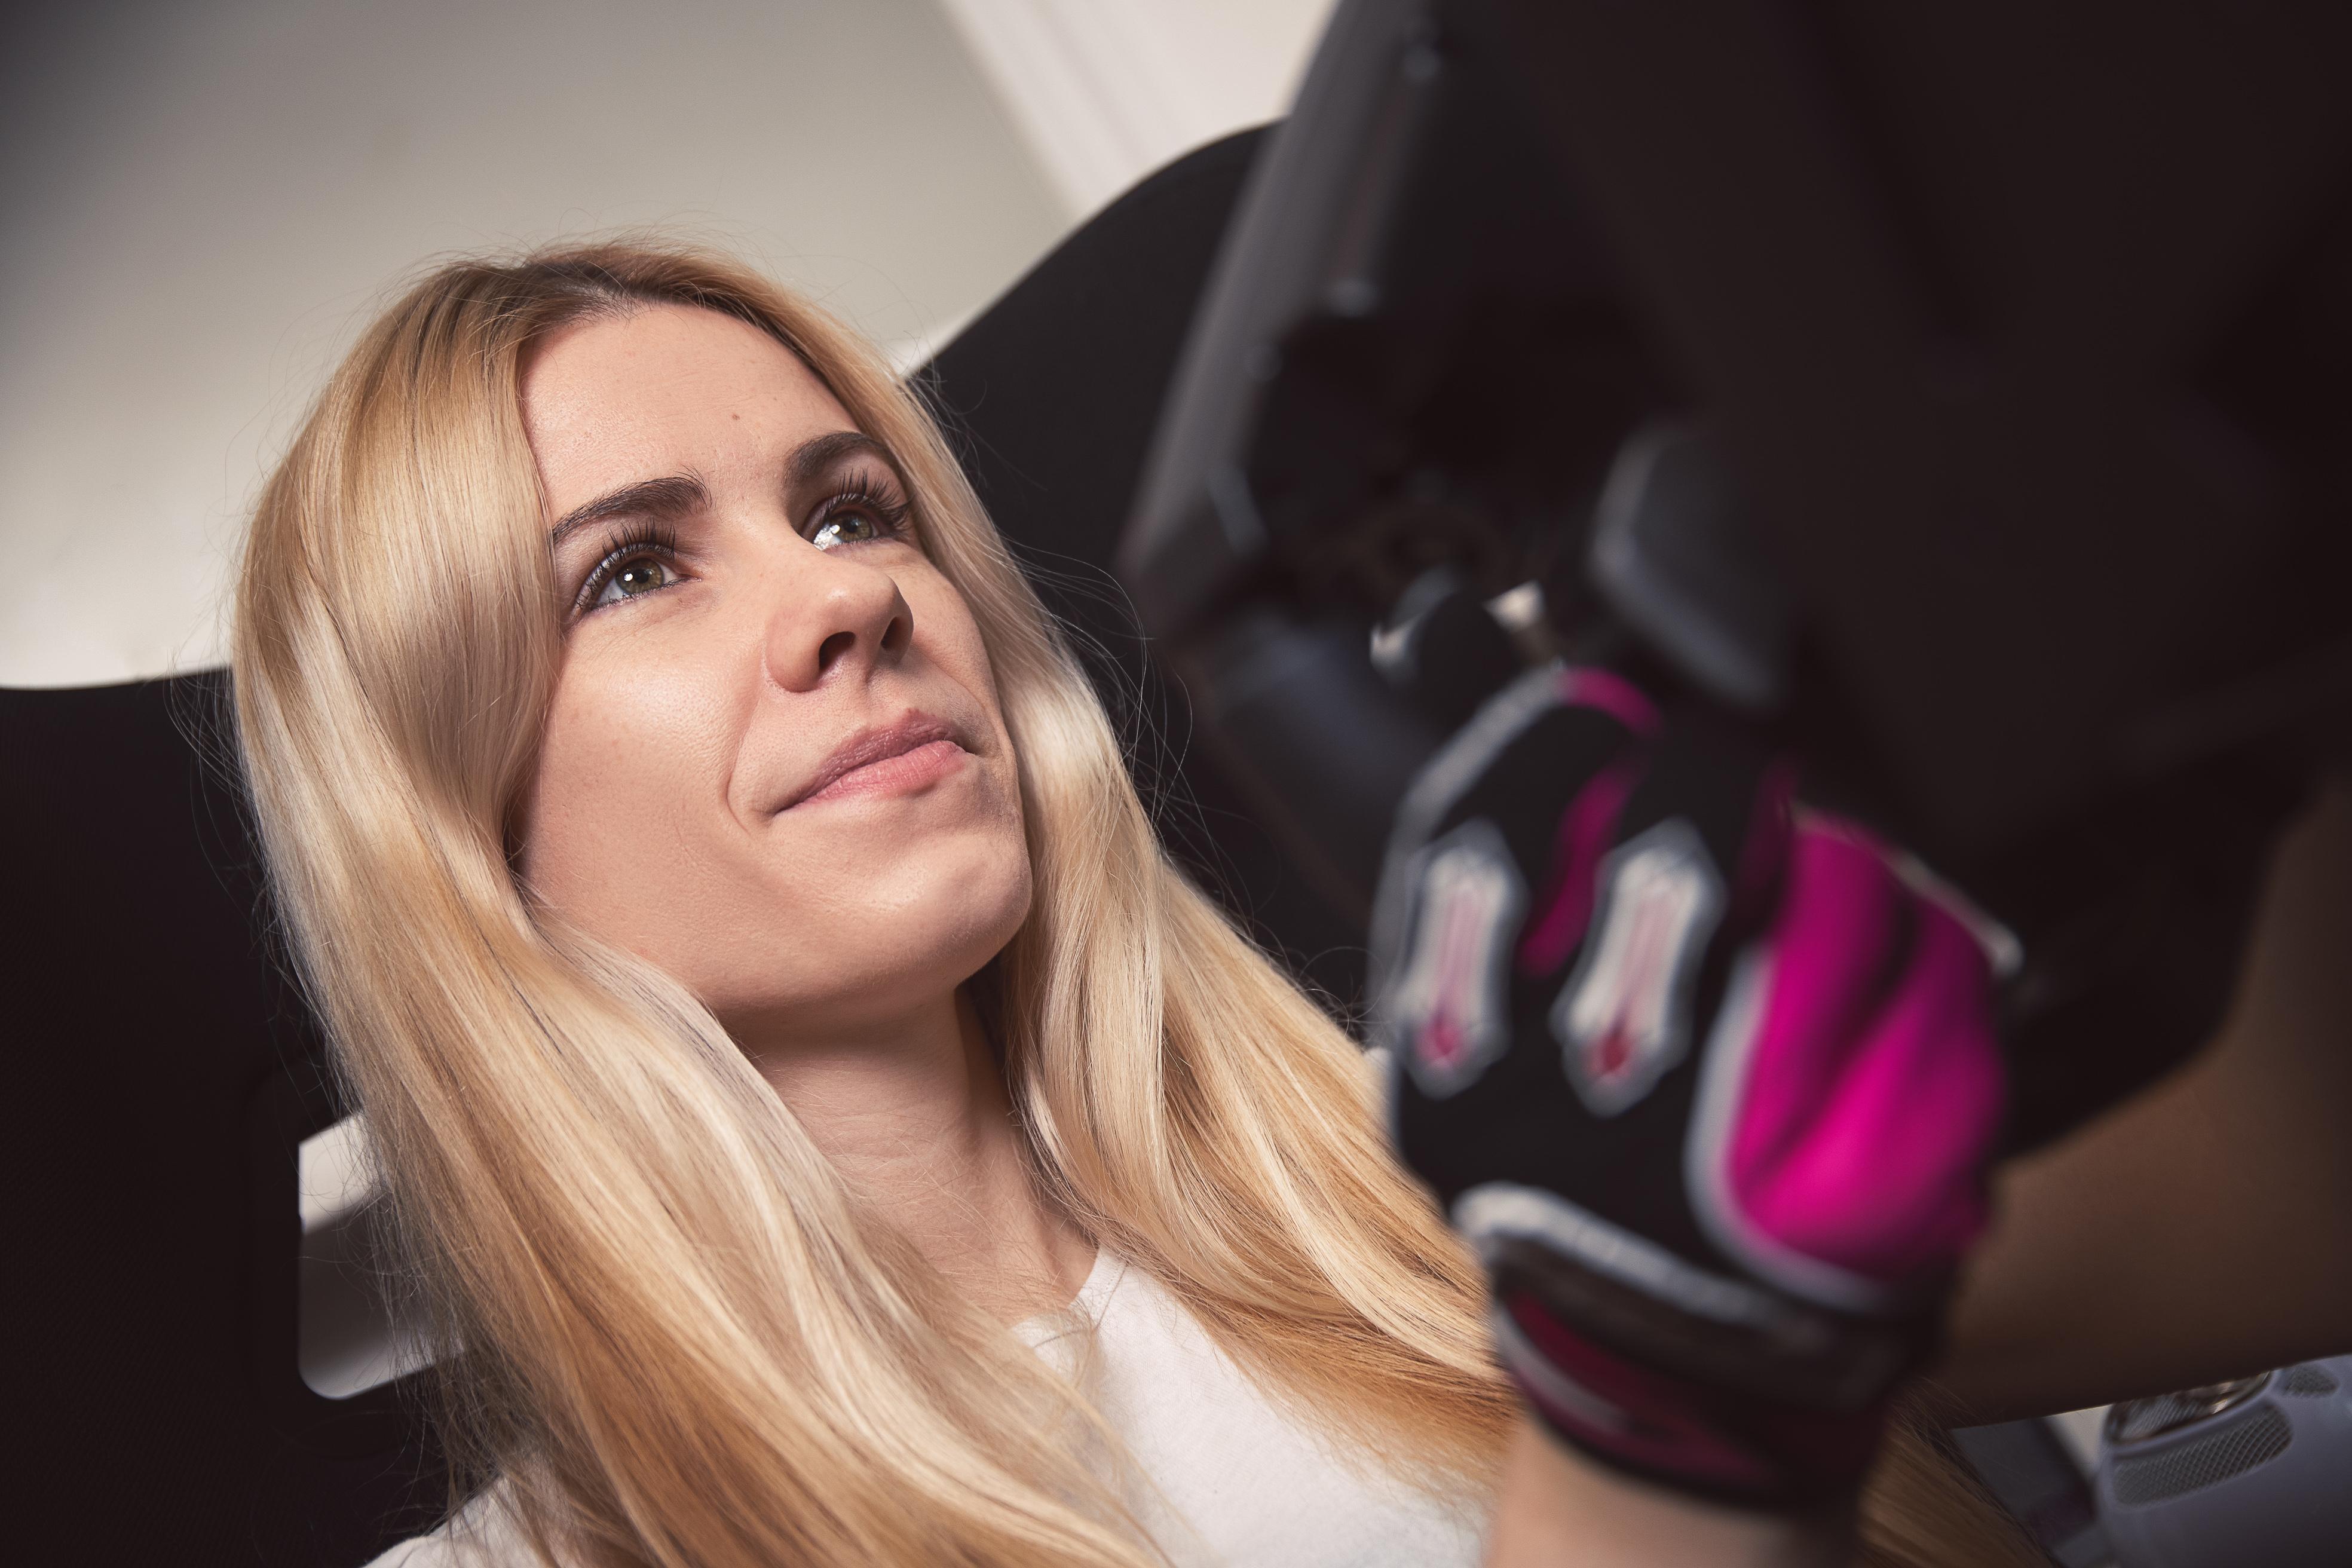 Alpine F1 Team:YouTube stars in line-up second Virtual Grand Prix